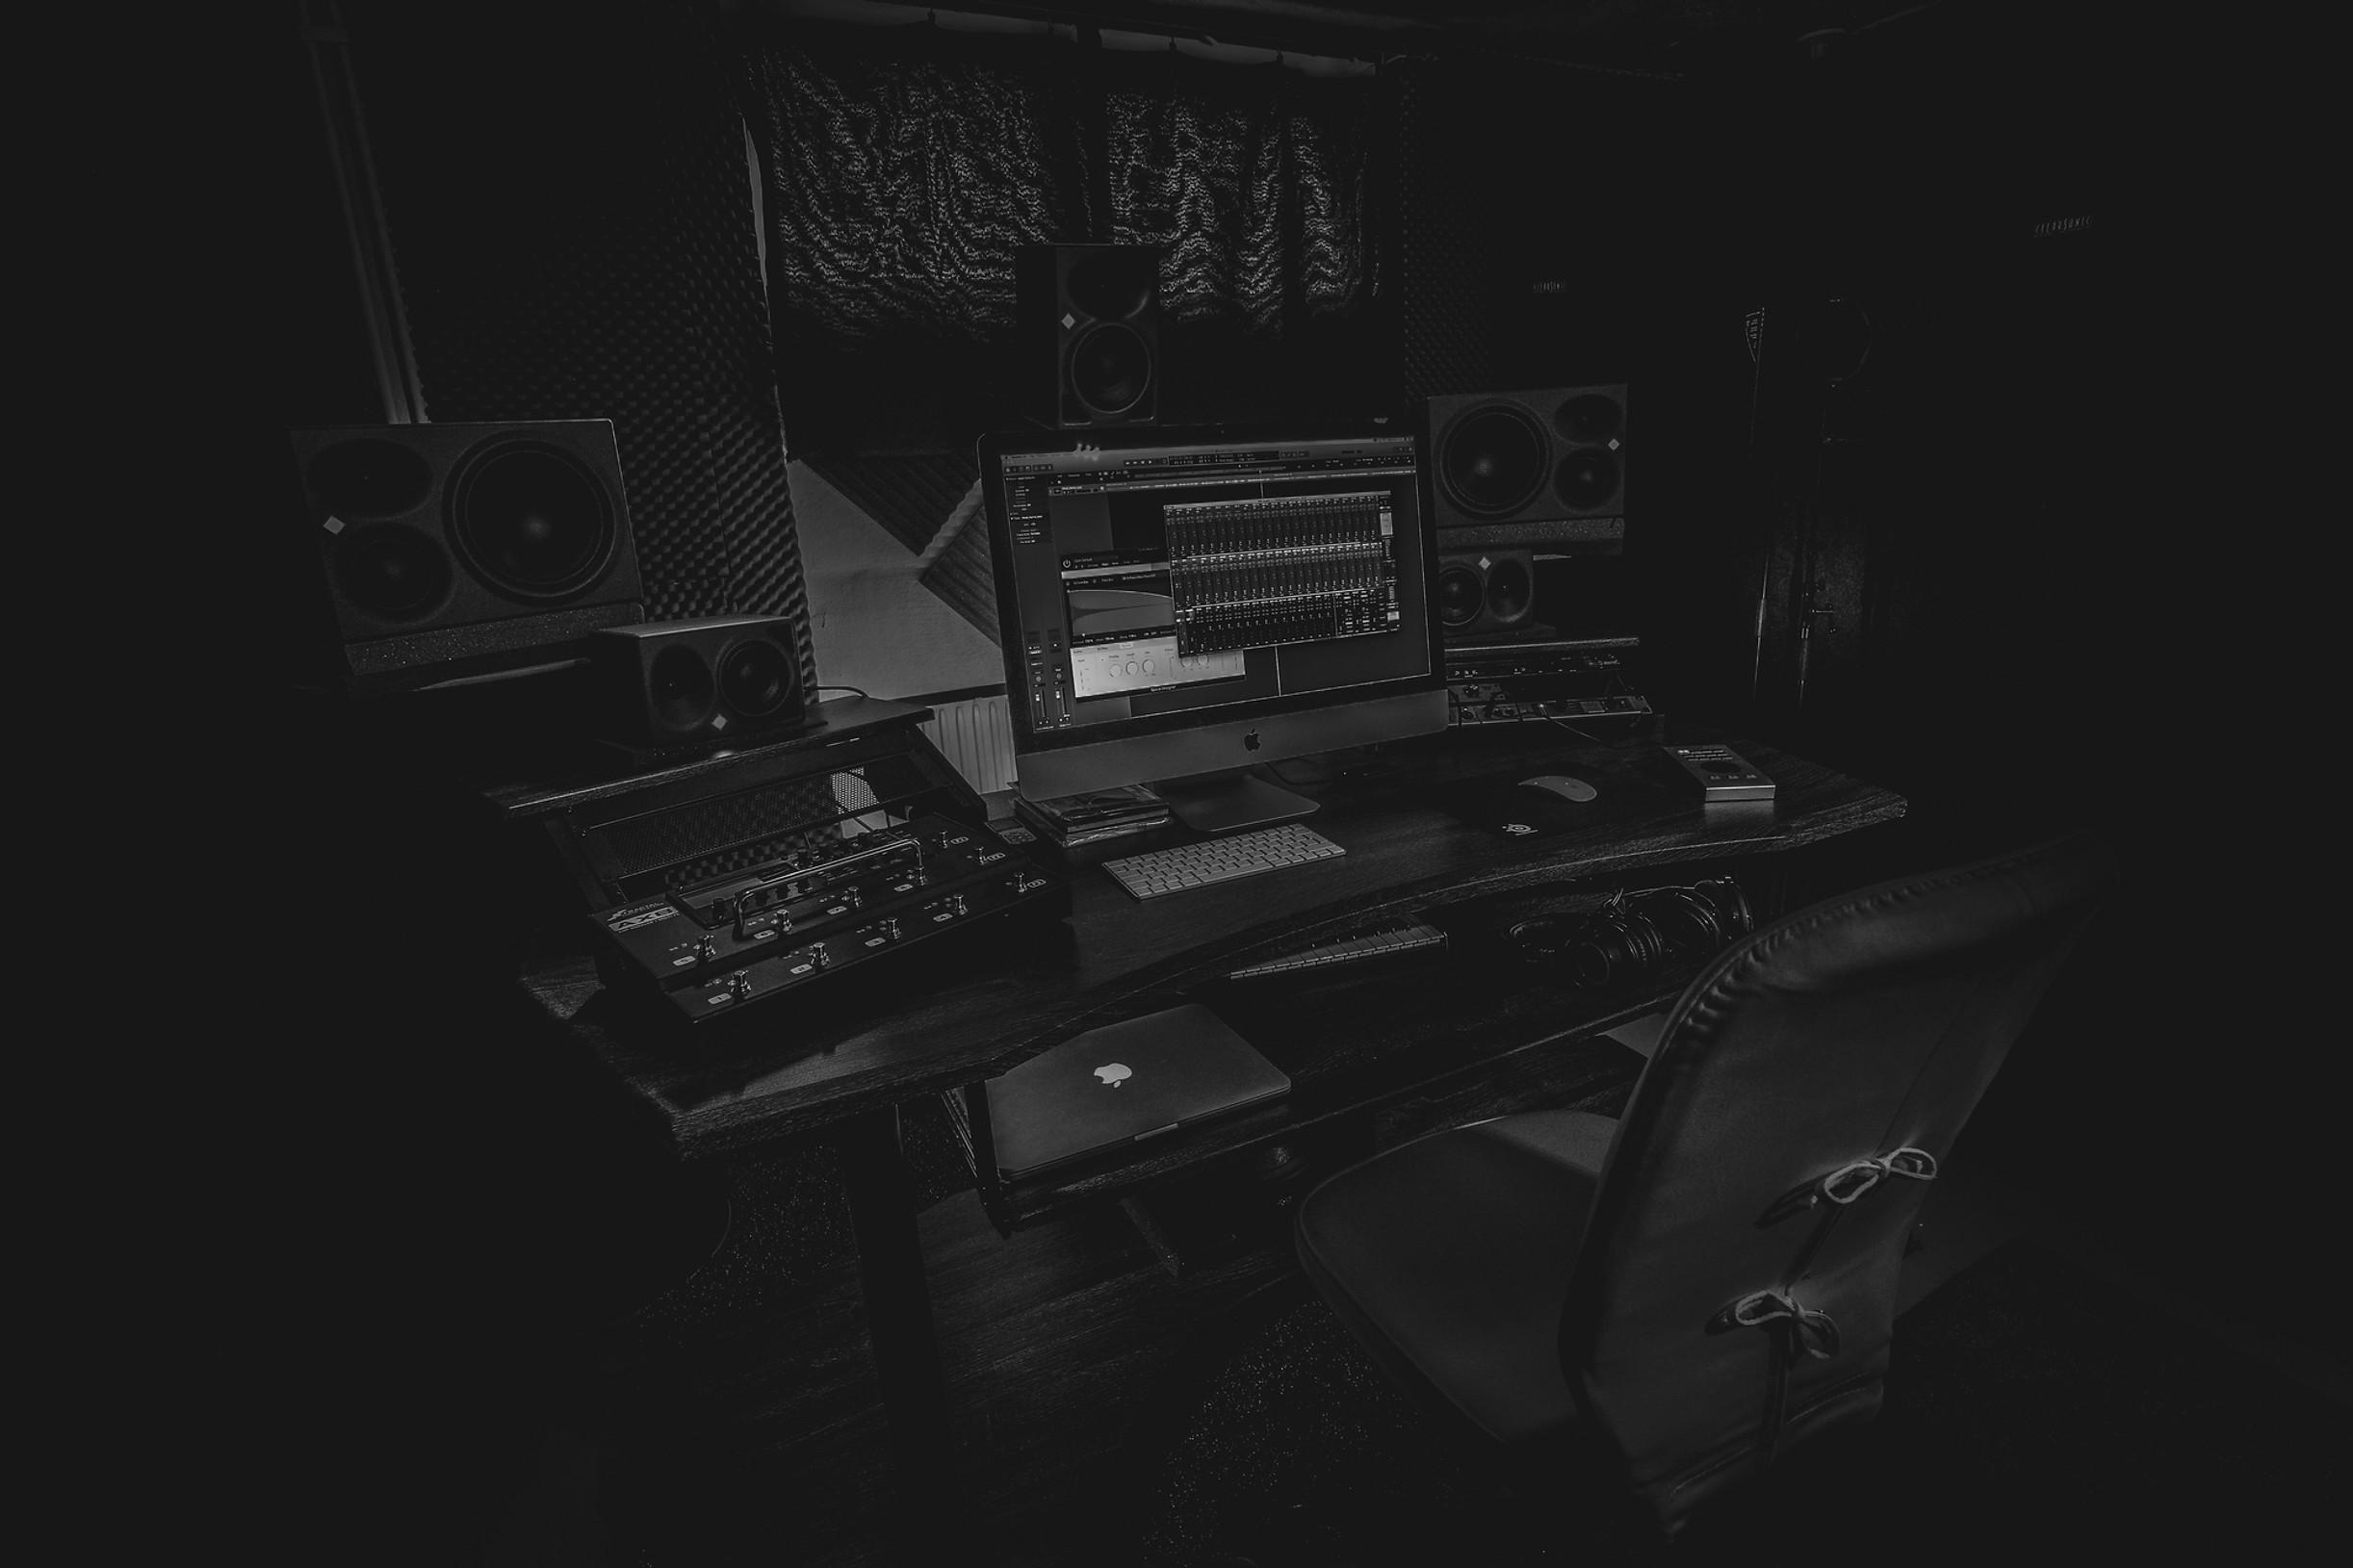 Hemsida_Studio7.jpg